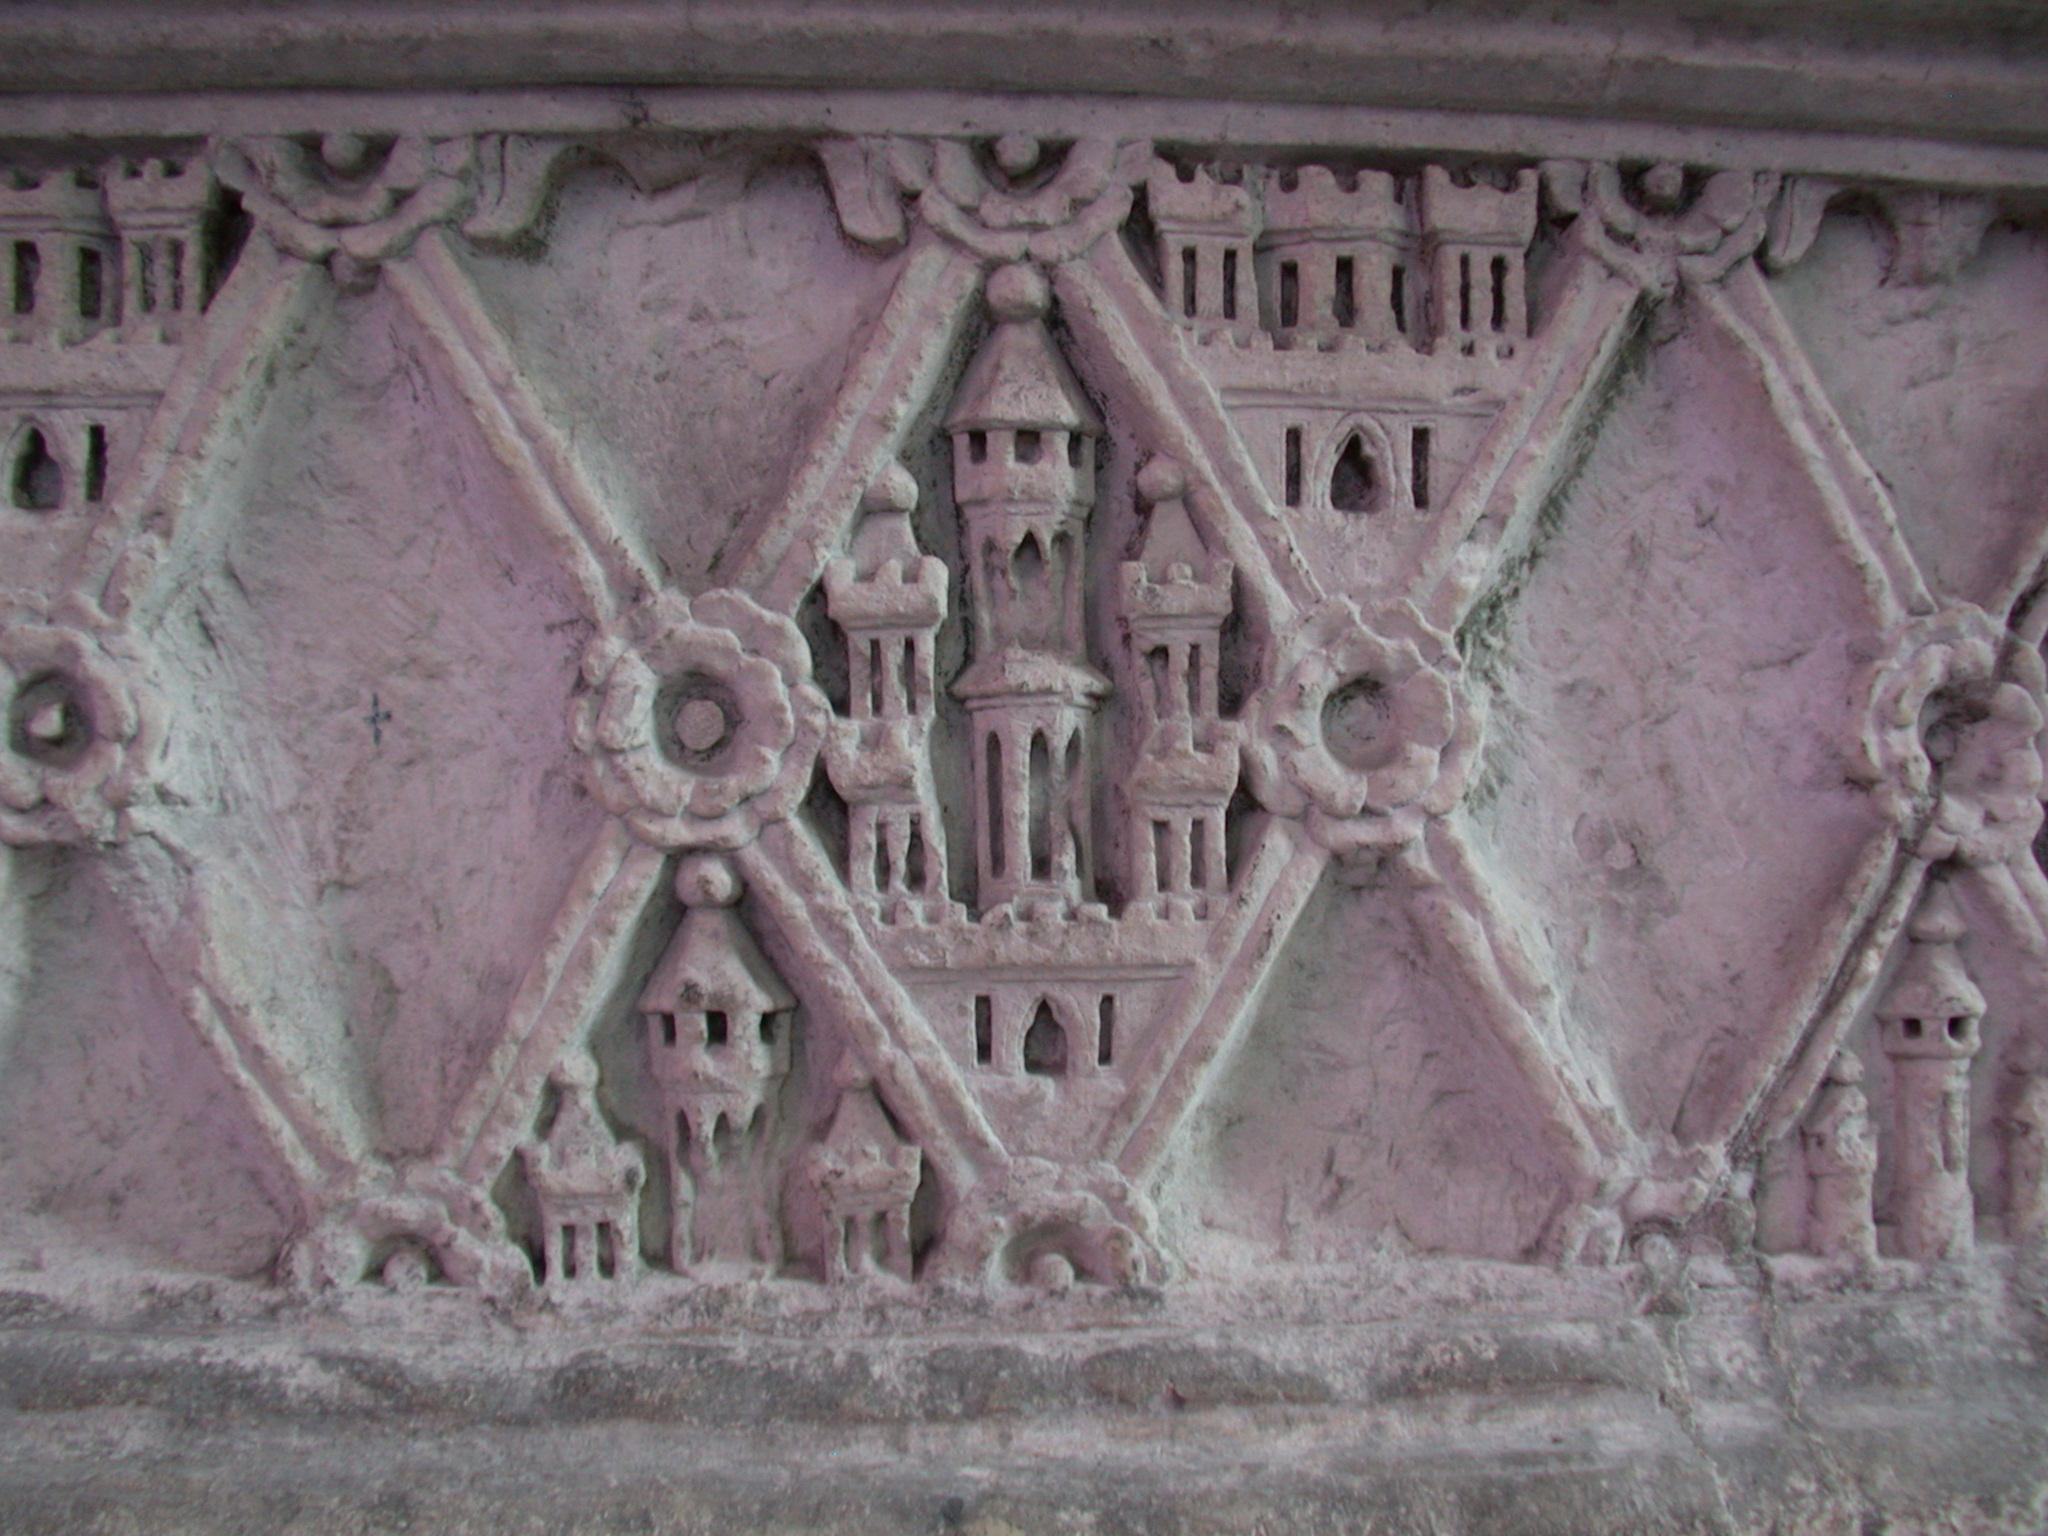 art sculptures graveridge diamonds stone texture gothic tower flower ornaments ornamented castle towers pattern